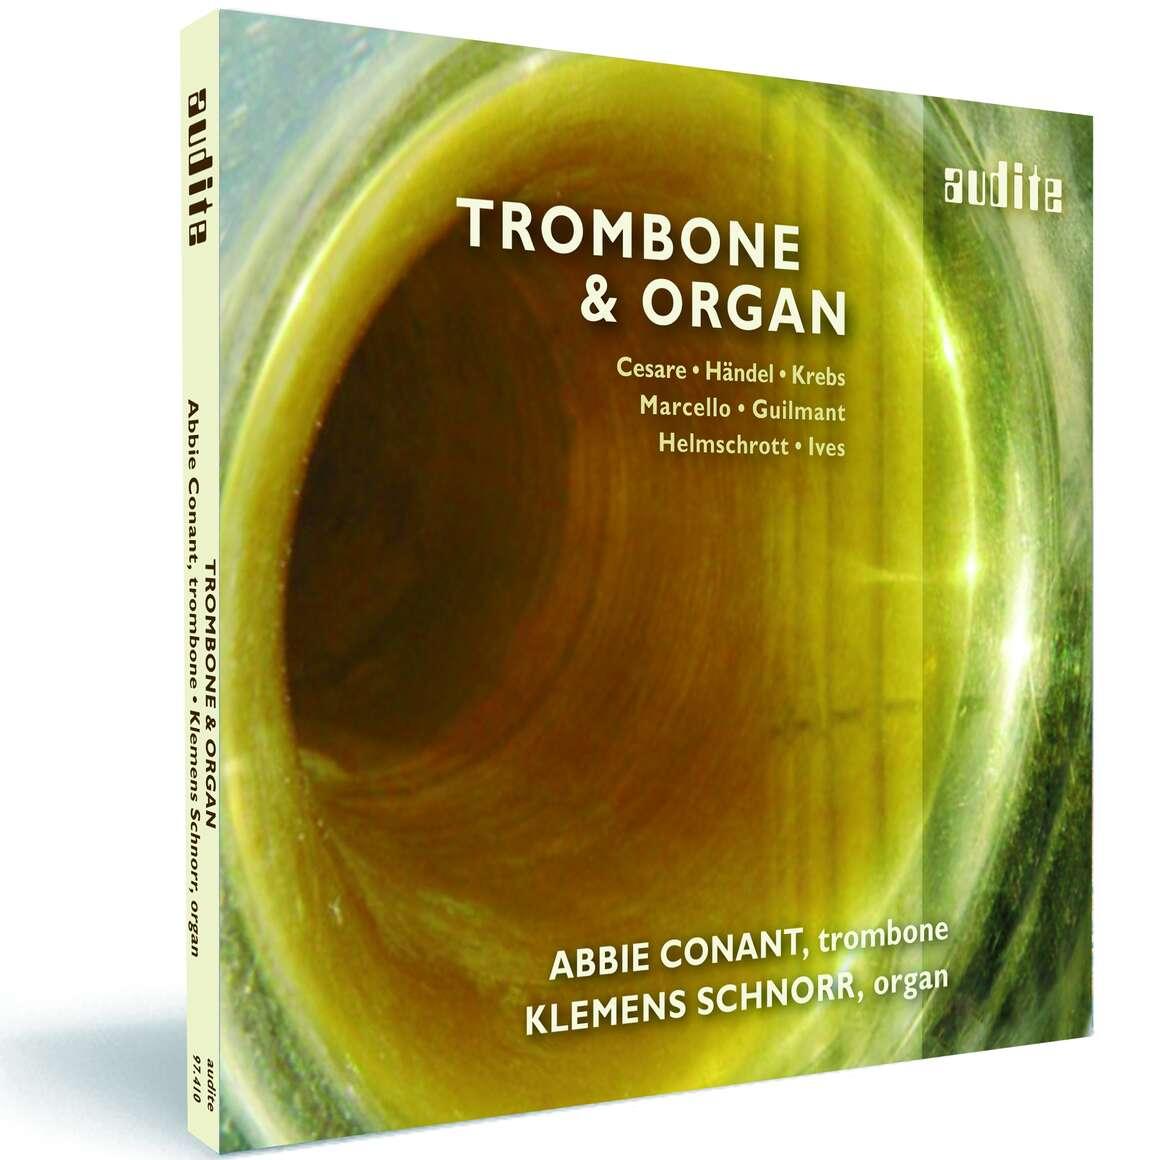 Trombone & Organ